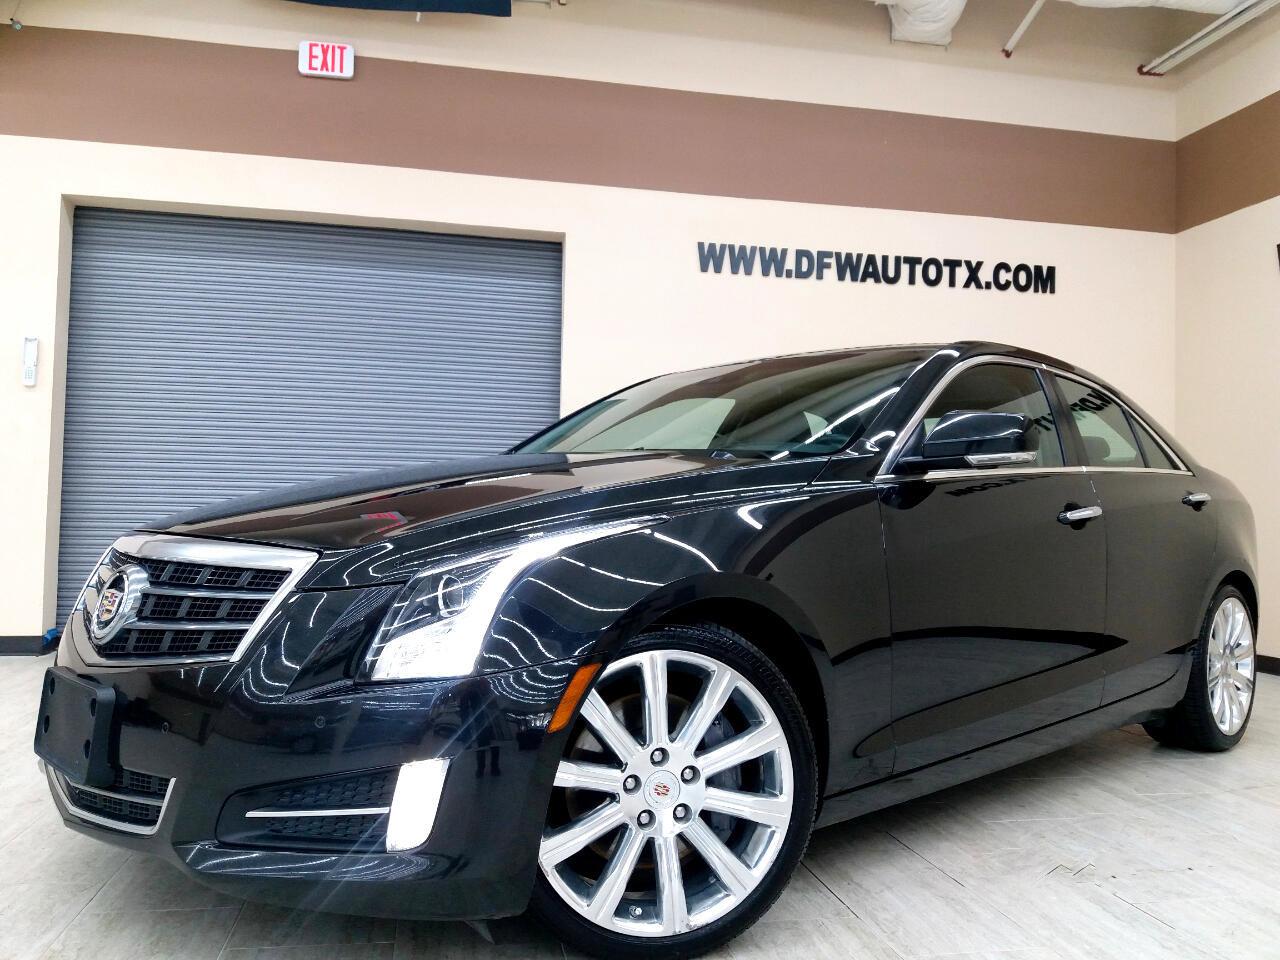 2014 Cadillac ATS 3.6 Premium Sedan image